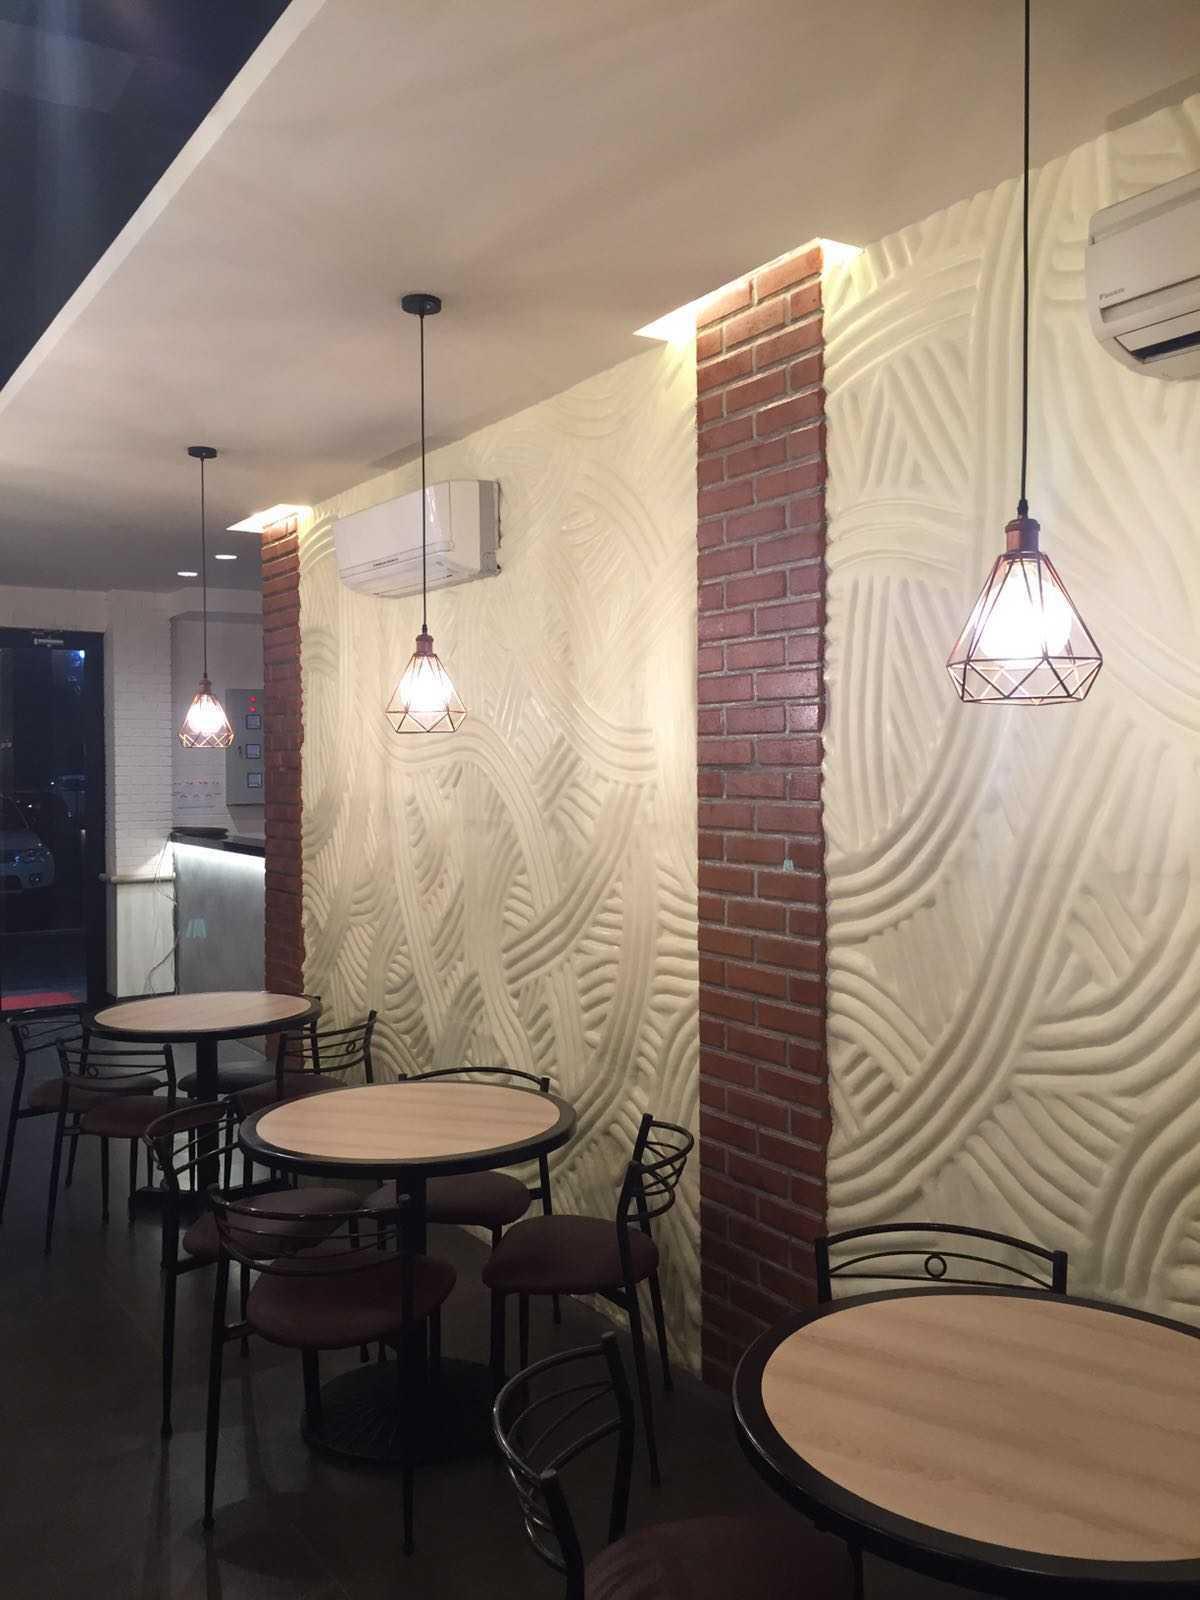 Meili Darmasetiawan Bakmi Permata Kebon Jeruk Kebon Jeruk Jakarta Kebon Jeruk Jakarta Dining Area Industrial  12803